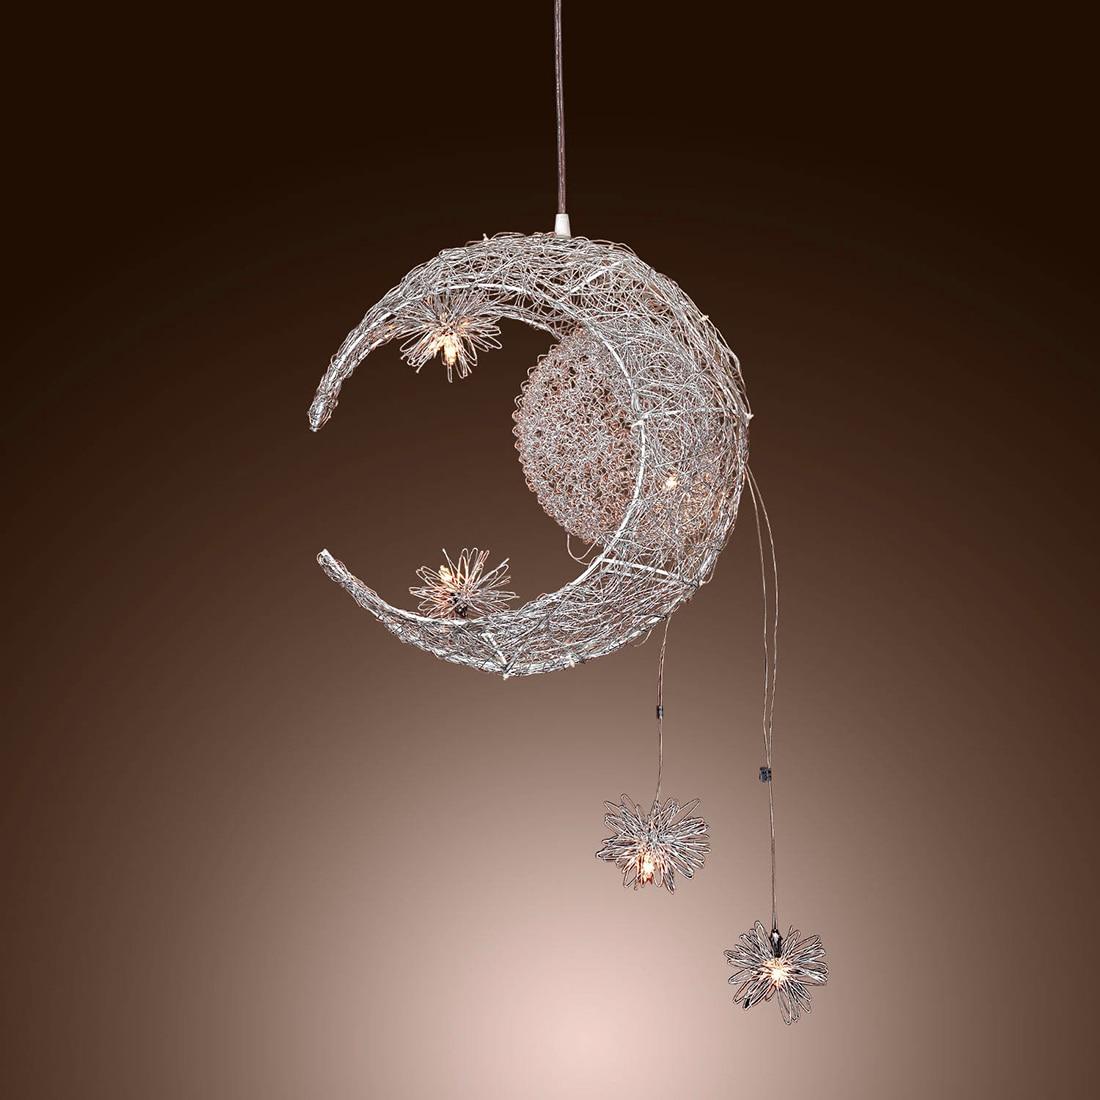 Hot Moon   Star Sweet Bedroom Lighting Pendant Lamp Chandelier Ceiling Light  Fixture China. Popular Moon Light Fixture Buy Cheap Moon Light Fixture lots from